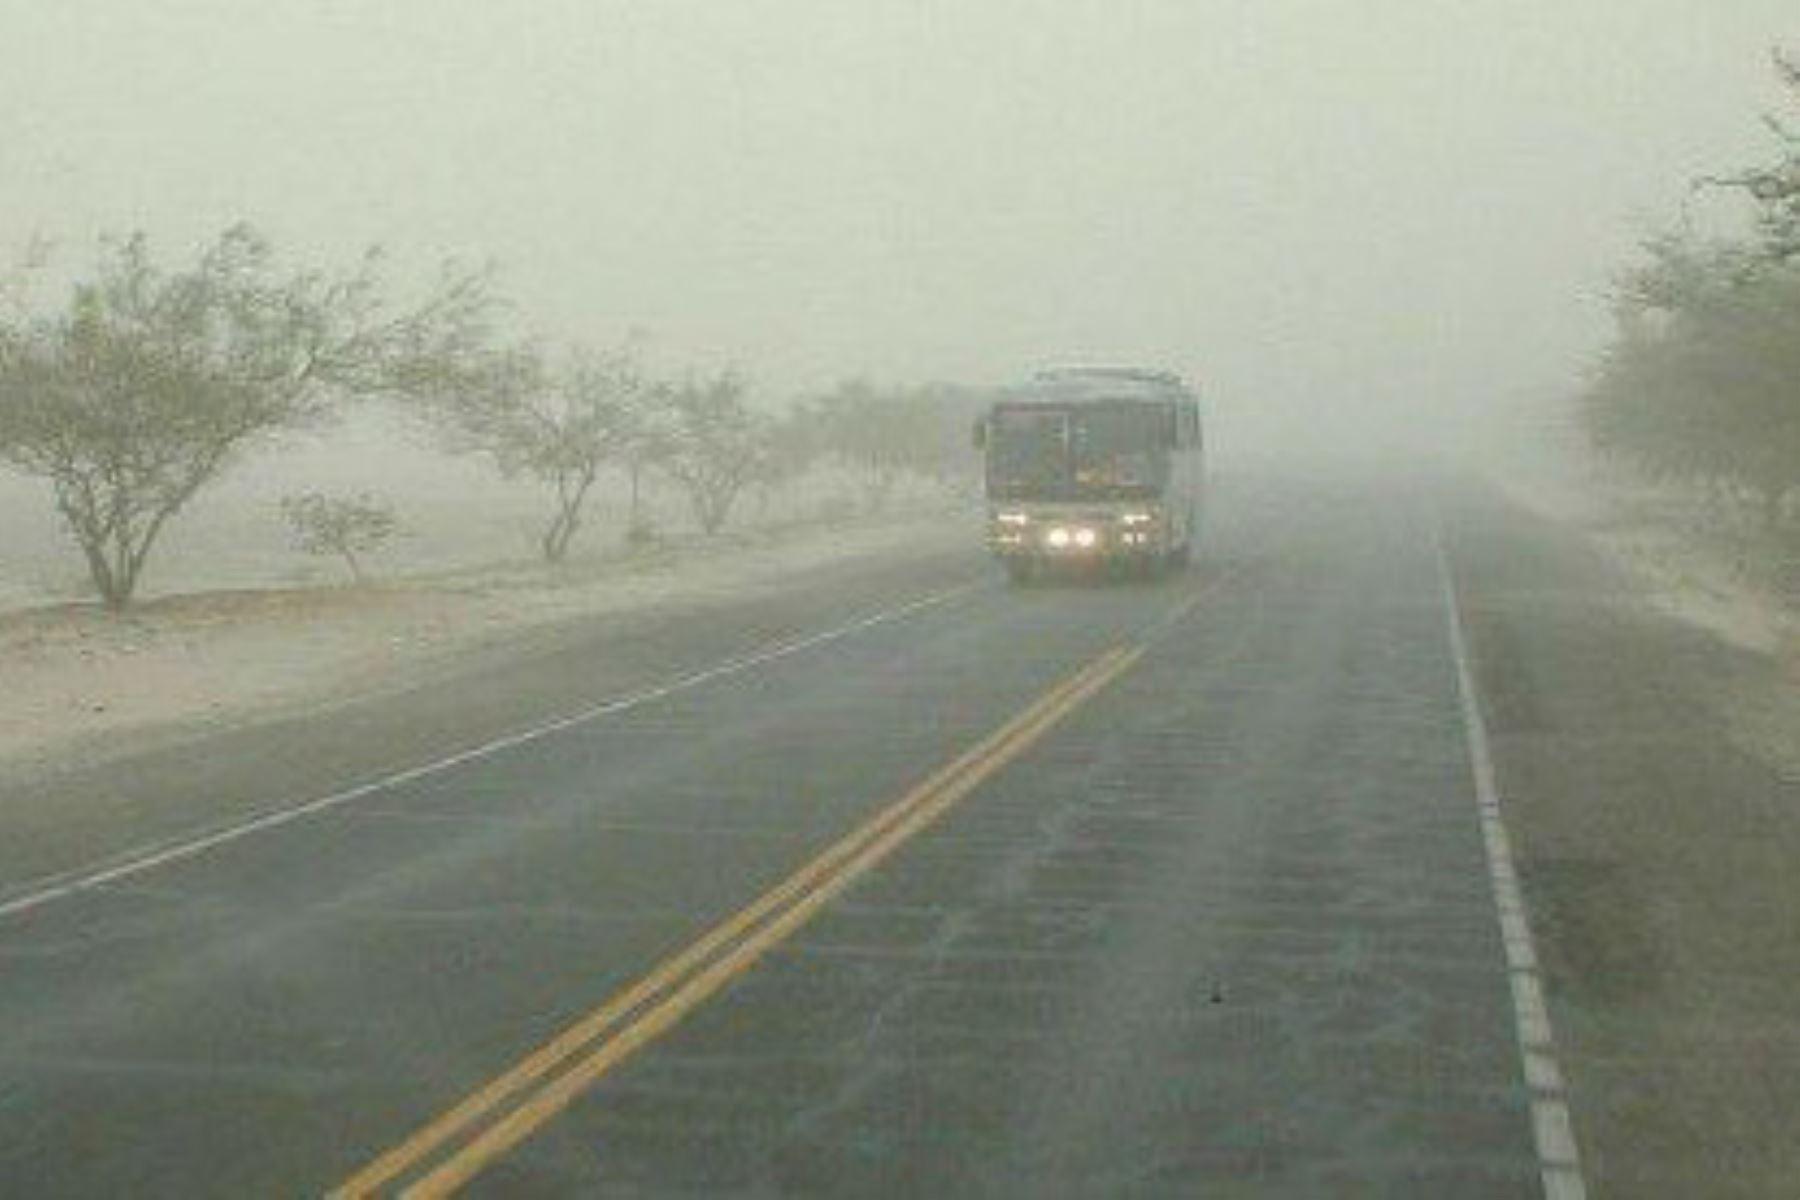 Ica soportará vientos con velocidades mayores a 35 kilómetros por hora desde este miércoles. Foto: ANDINA/Difusión